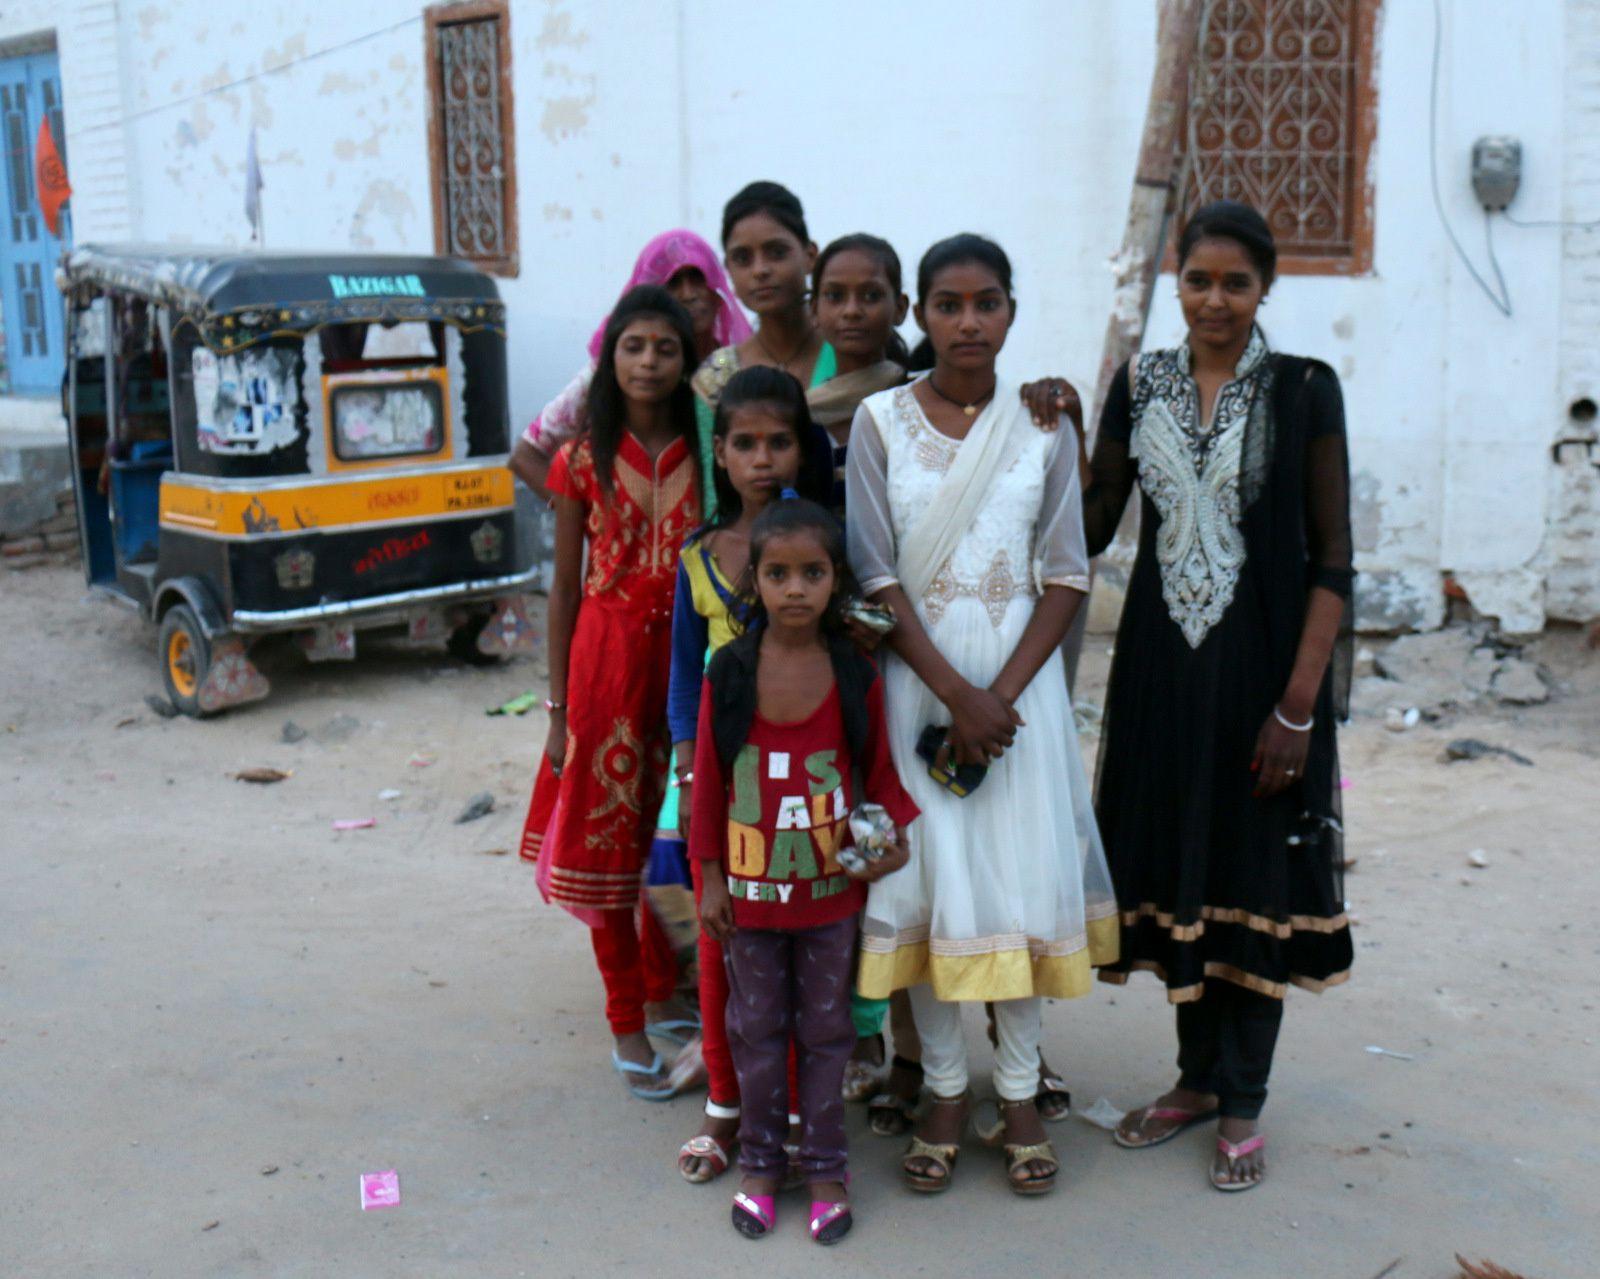 Les marchands du temple de Karni Mata, Deshnoke (Inde)